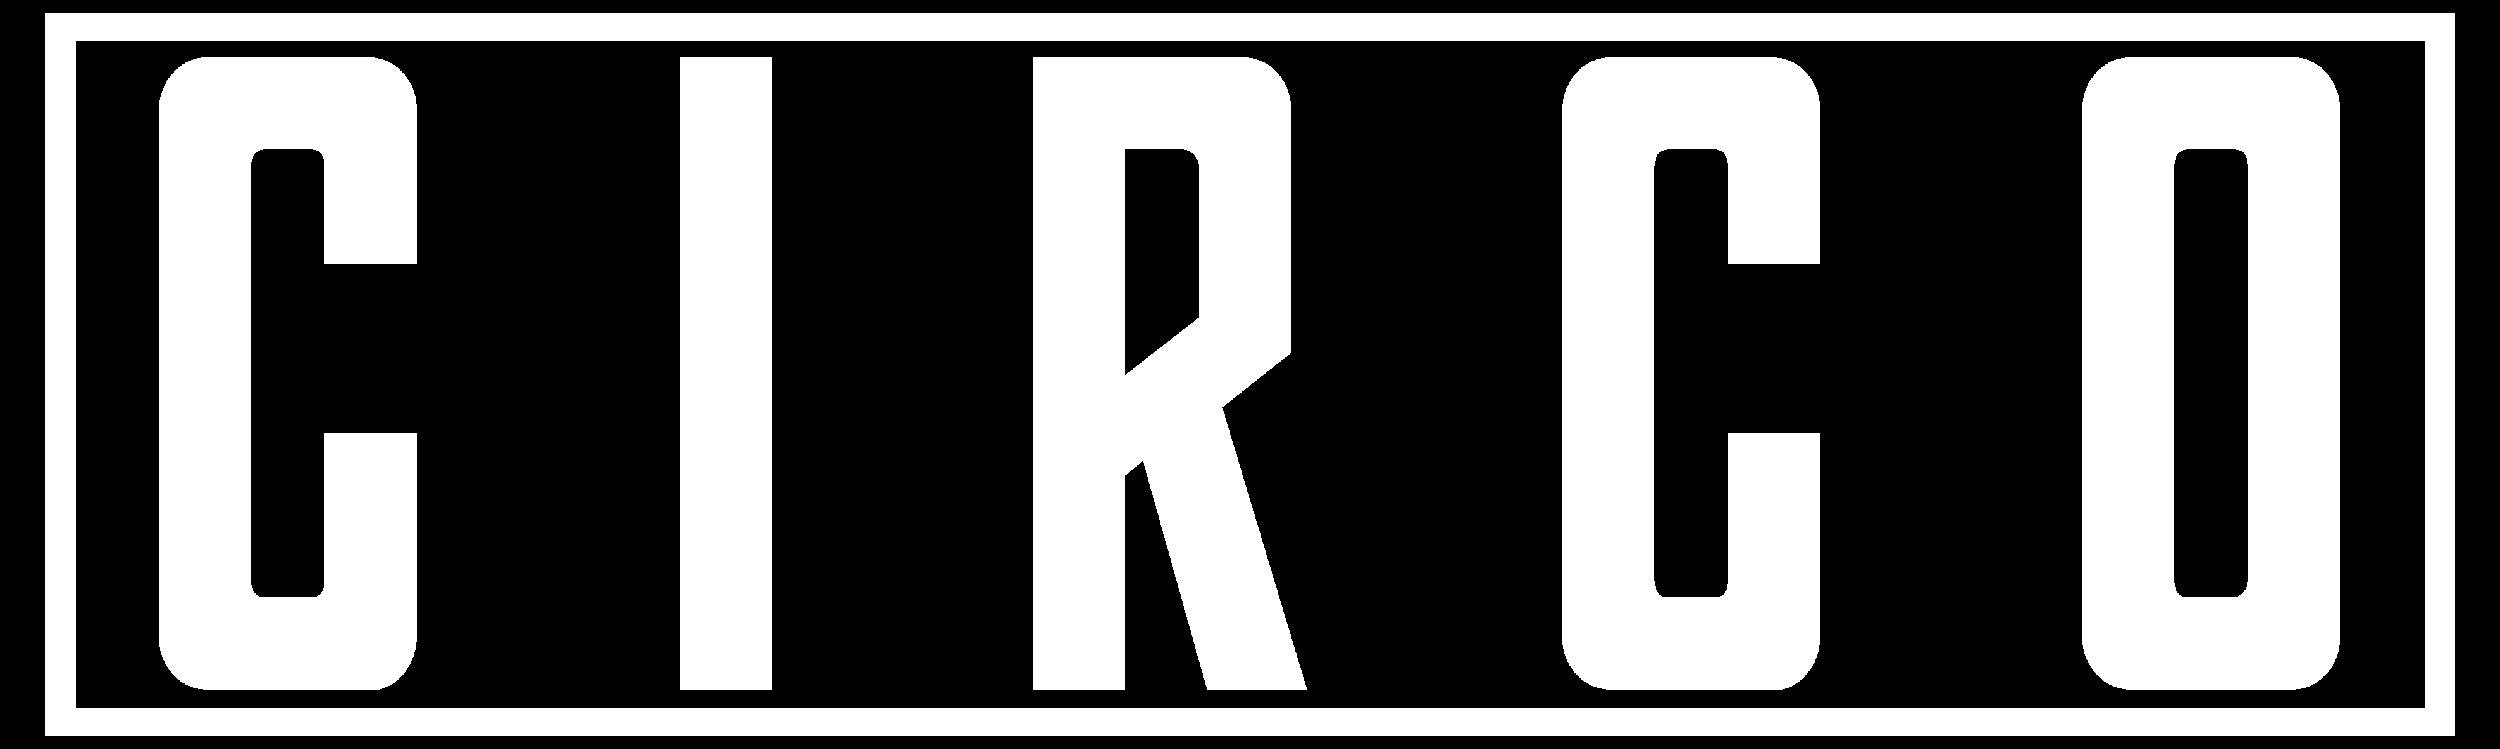 CIRCO Block WHT Logo.png